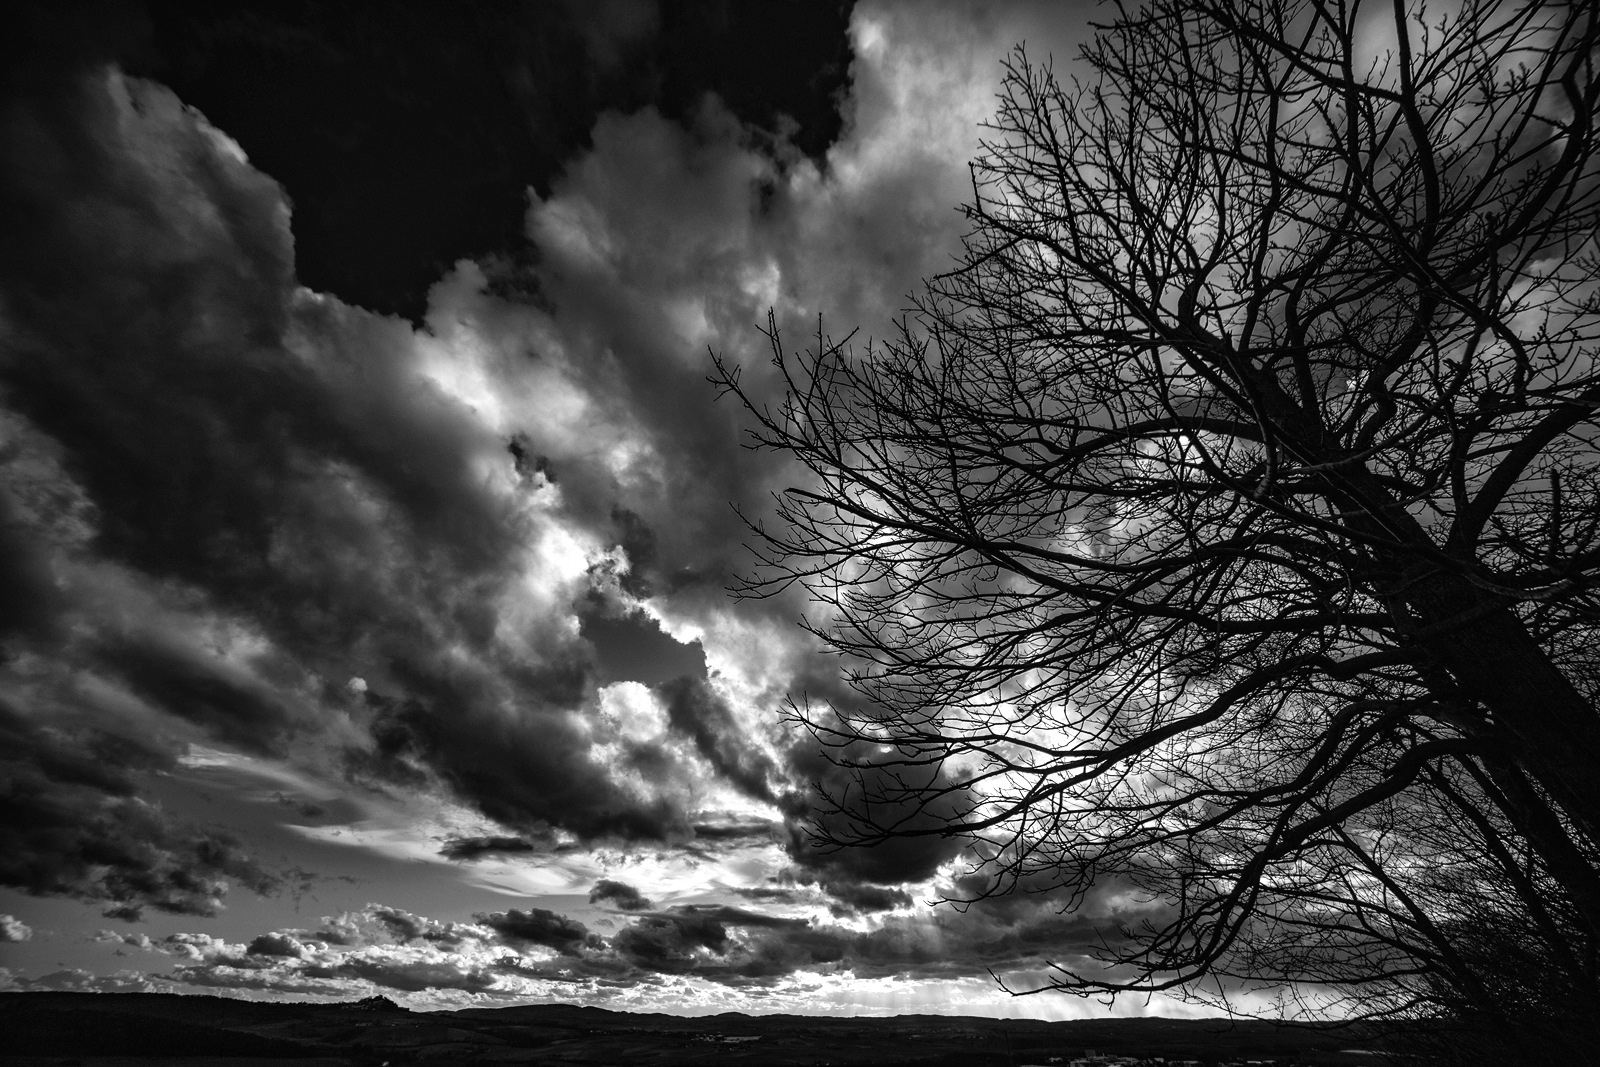 Windy by karlvock